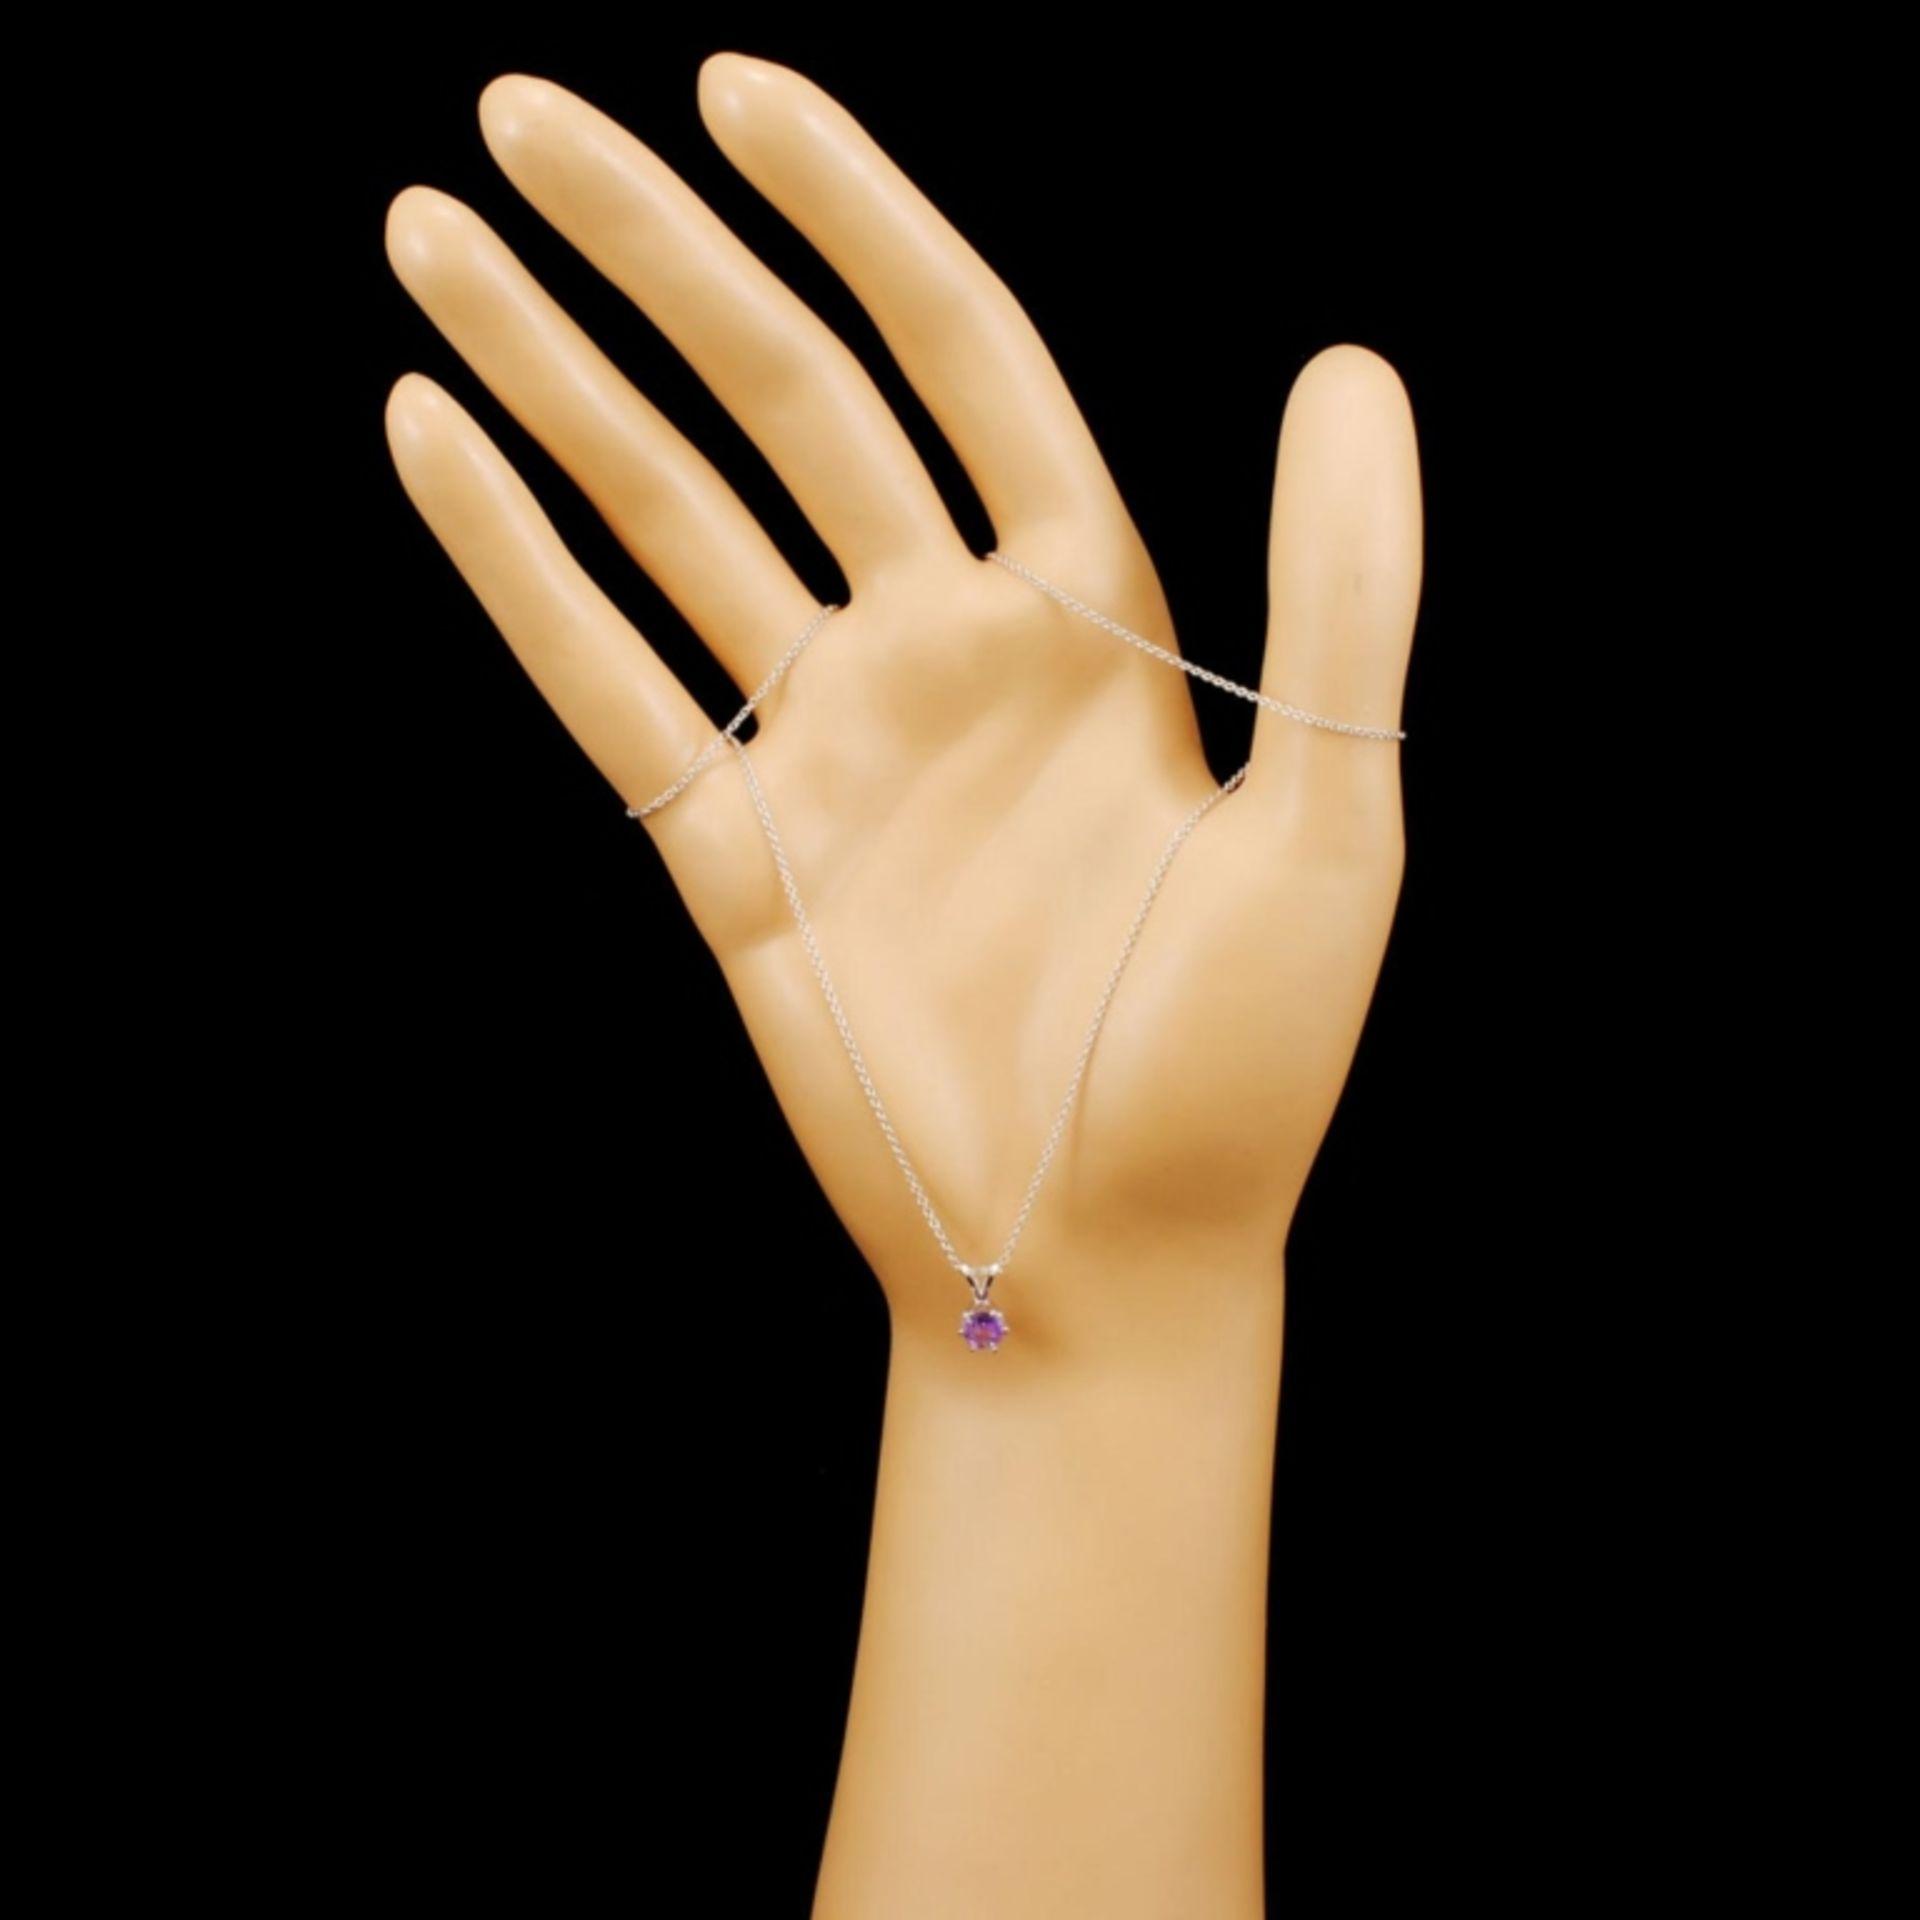 14K Gold 0.67ctw Sapphire Pendant - Image 3 of 4